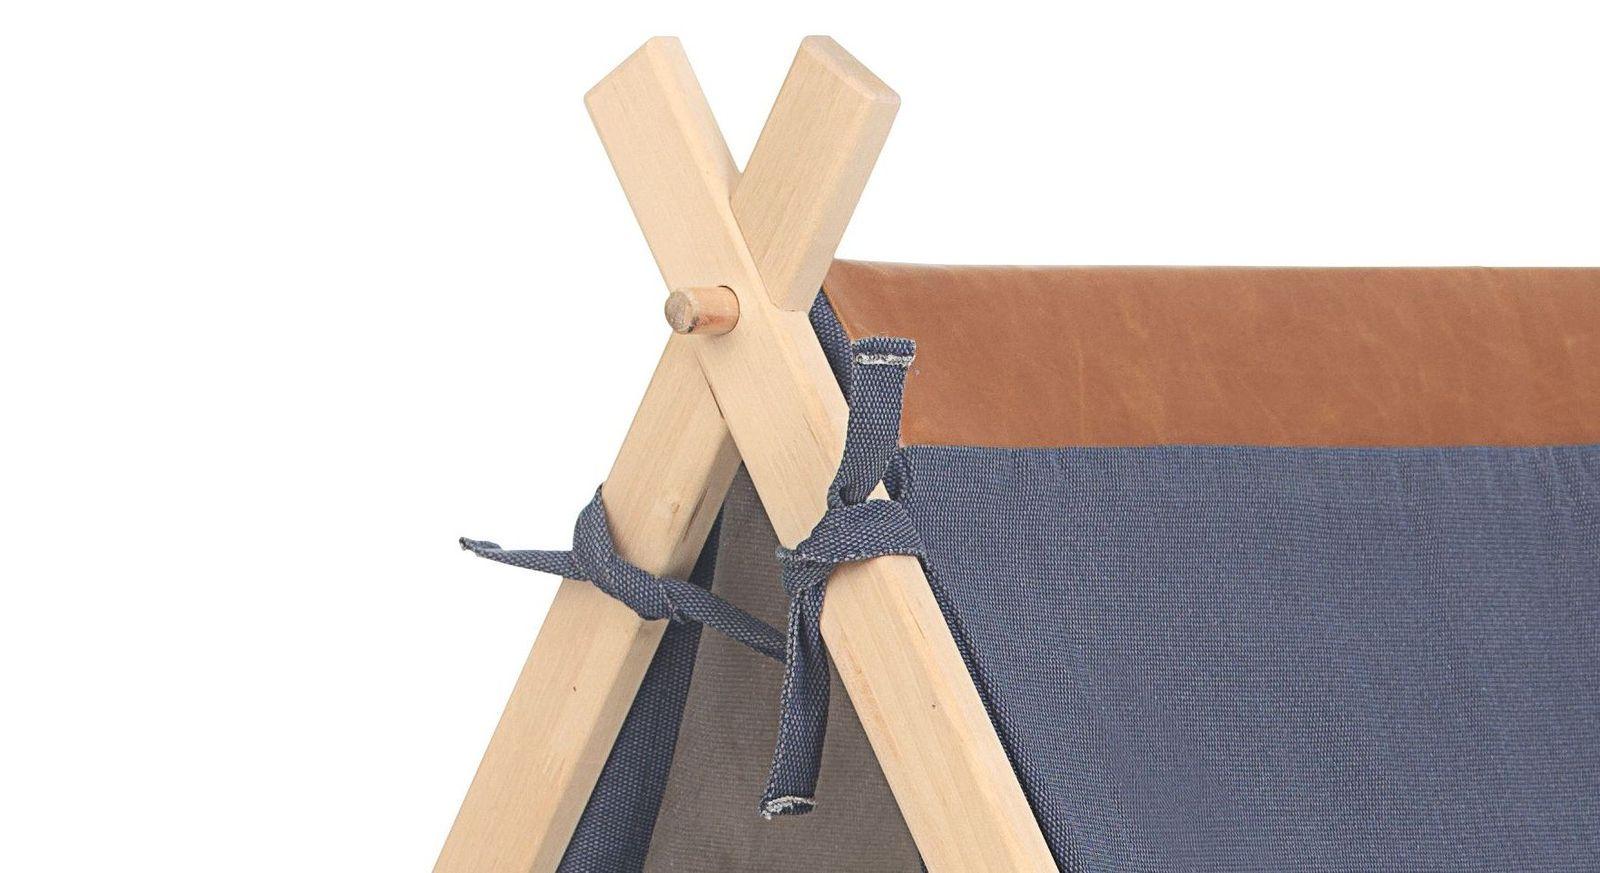 LIFETIME Spielzelt mit massiver Konstruktion aus Holz